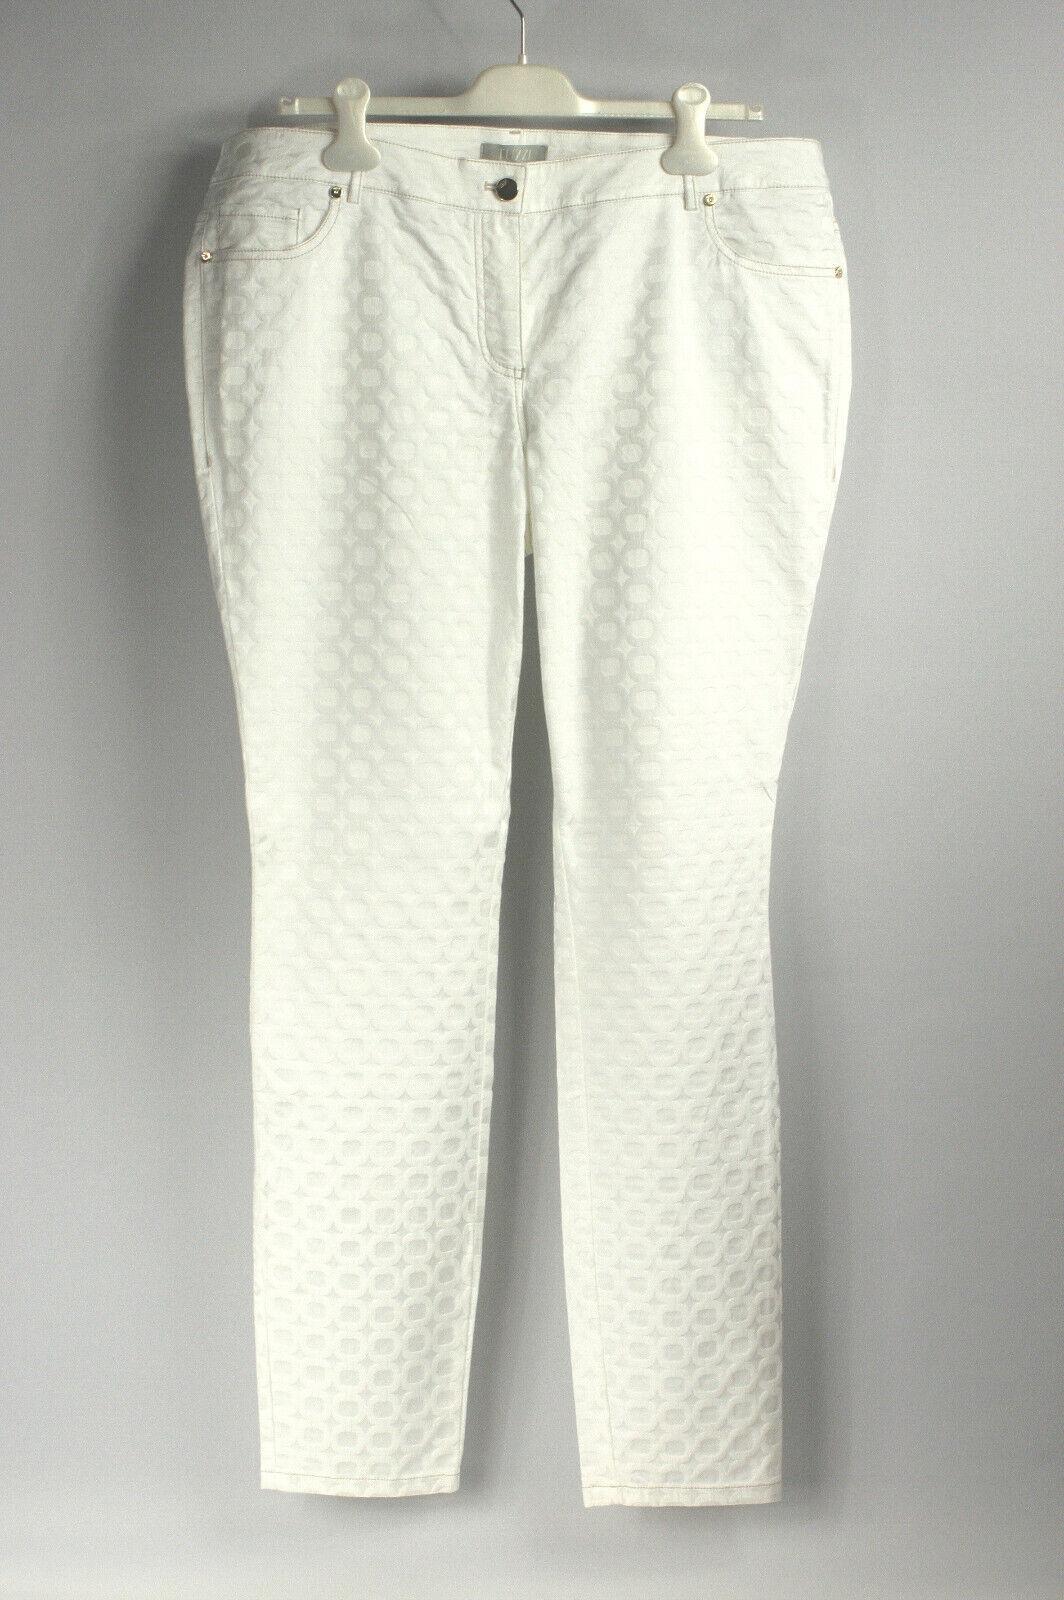 Tuzzi Hose white Baumwolle Viskose Elasthan Gr. 44